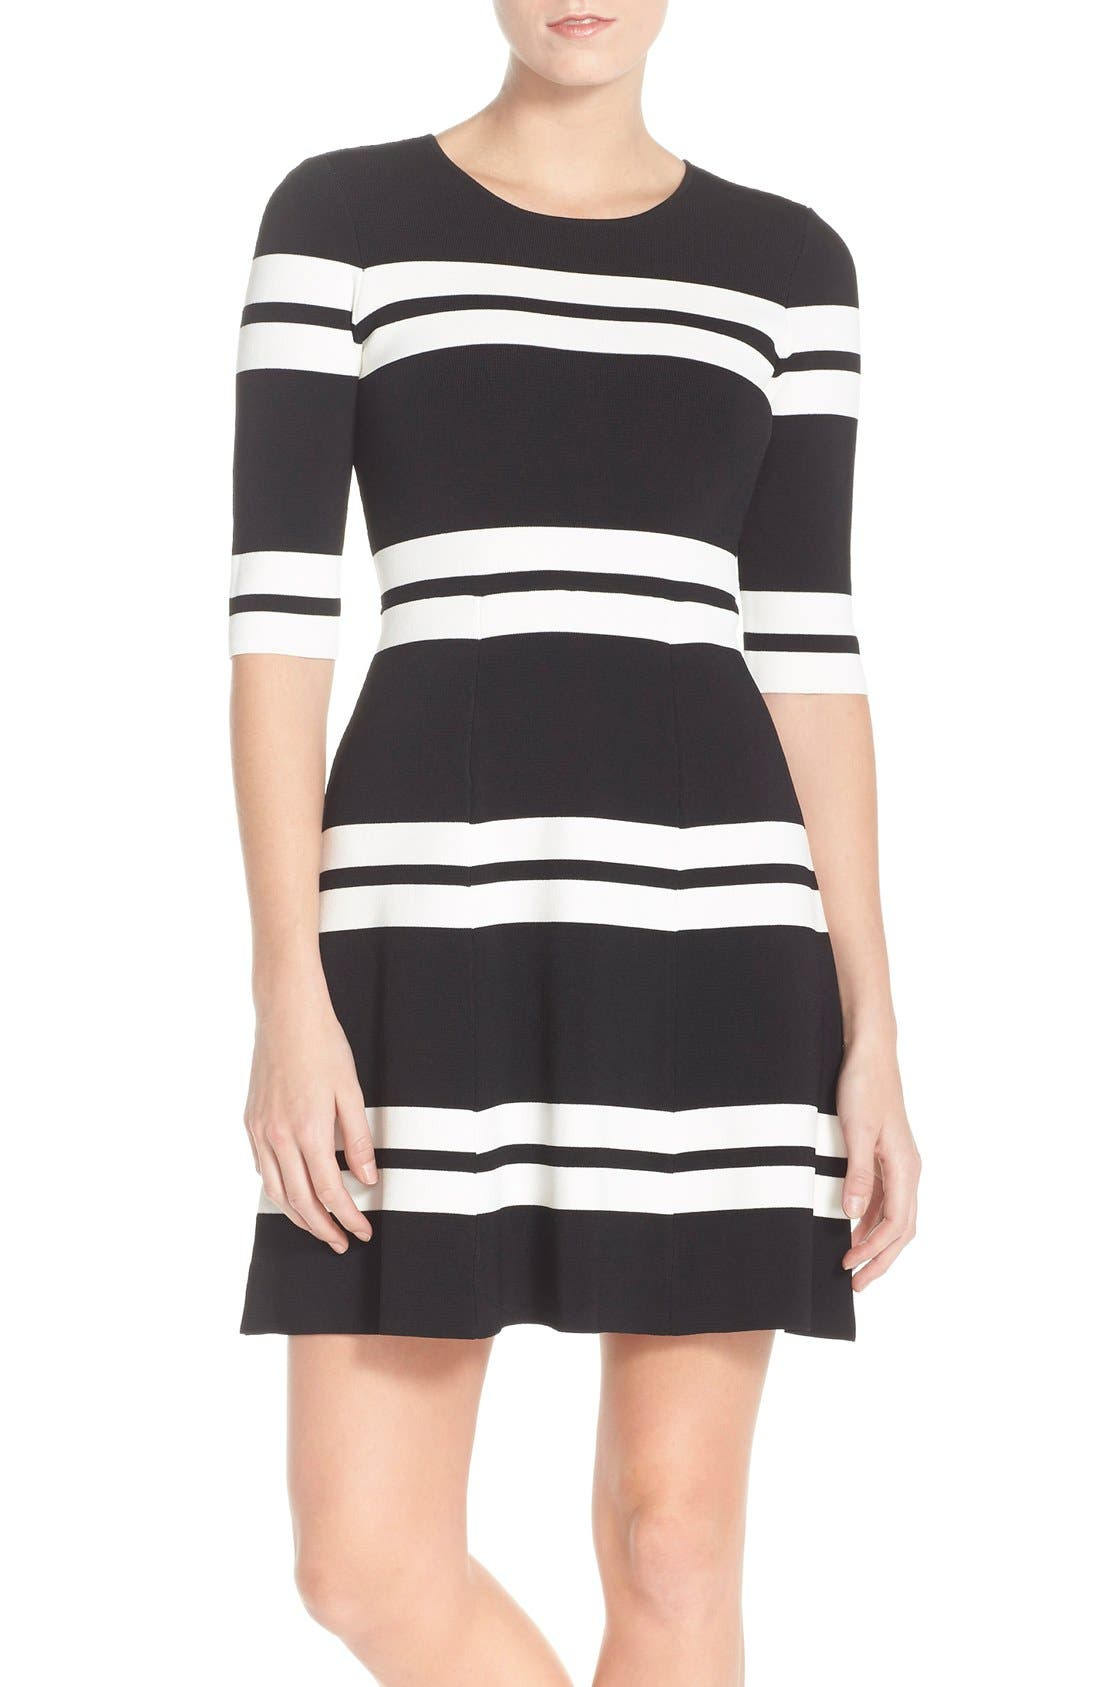 Alternate Image 1 Selected - Eliza J Stripe Sweater Fit & Flare Dress (Regular & Petite)